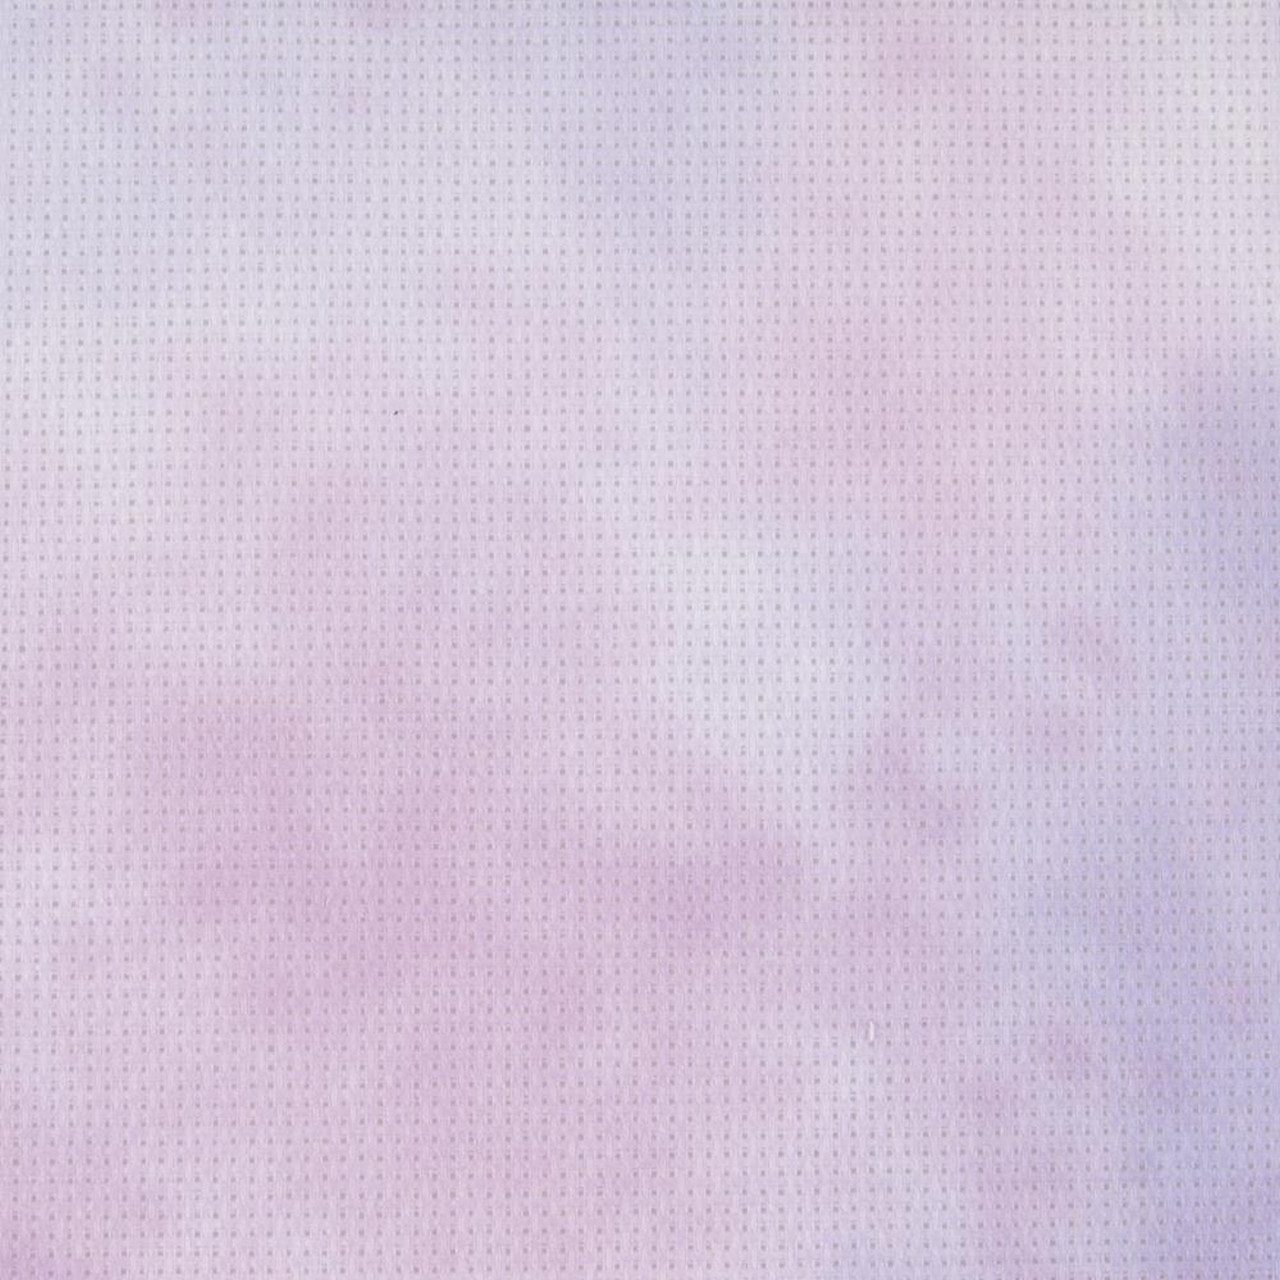 "DMC / Charles Craft Sunset Print 14 Count Aida Fabric - 15"" x 18"""